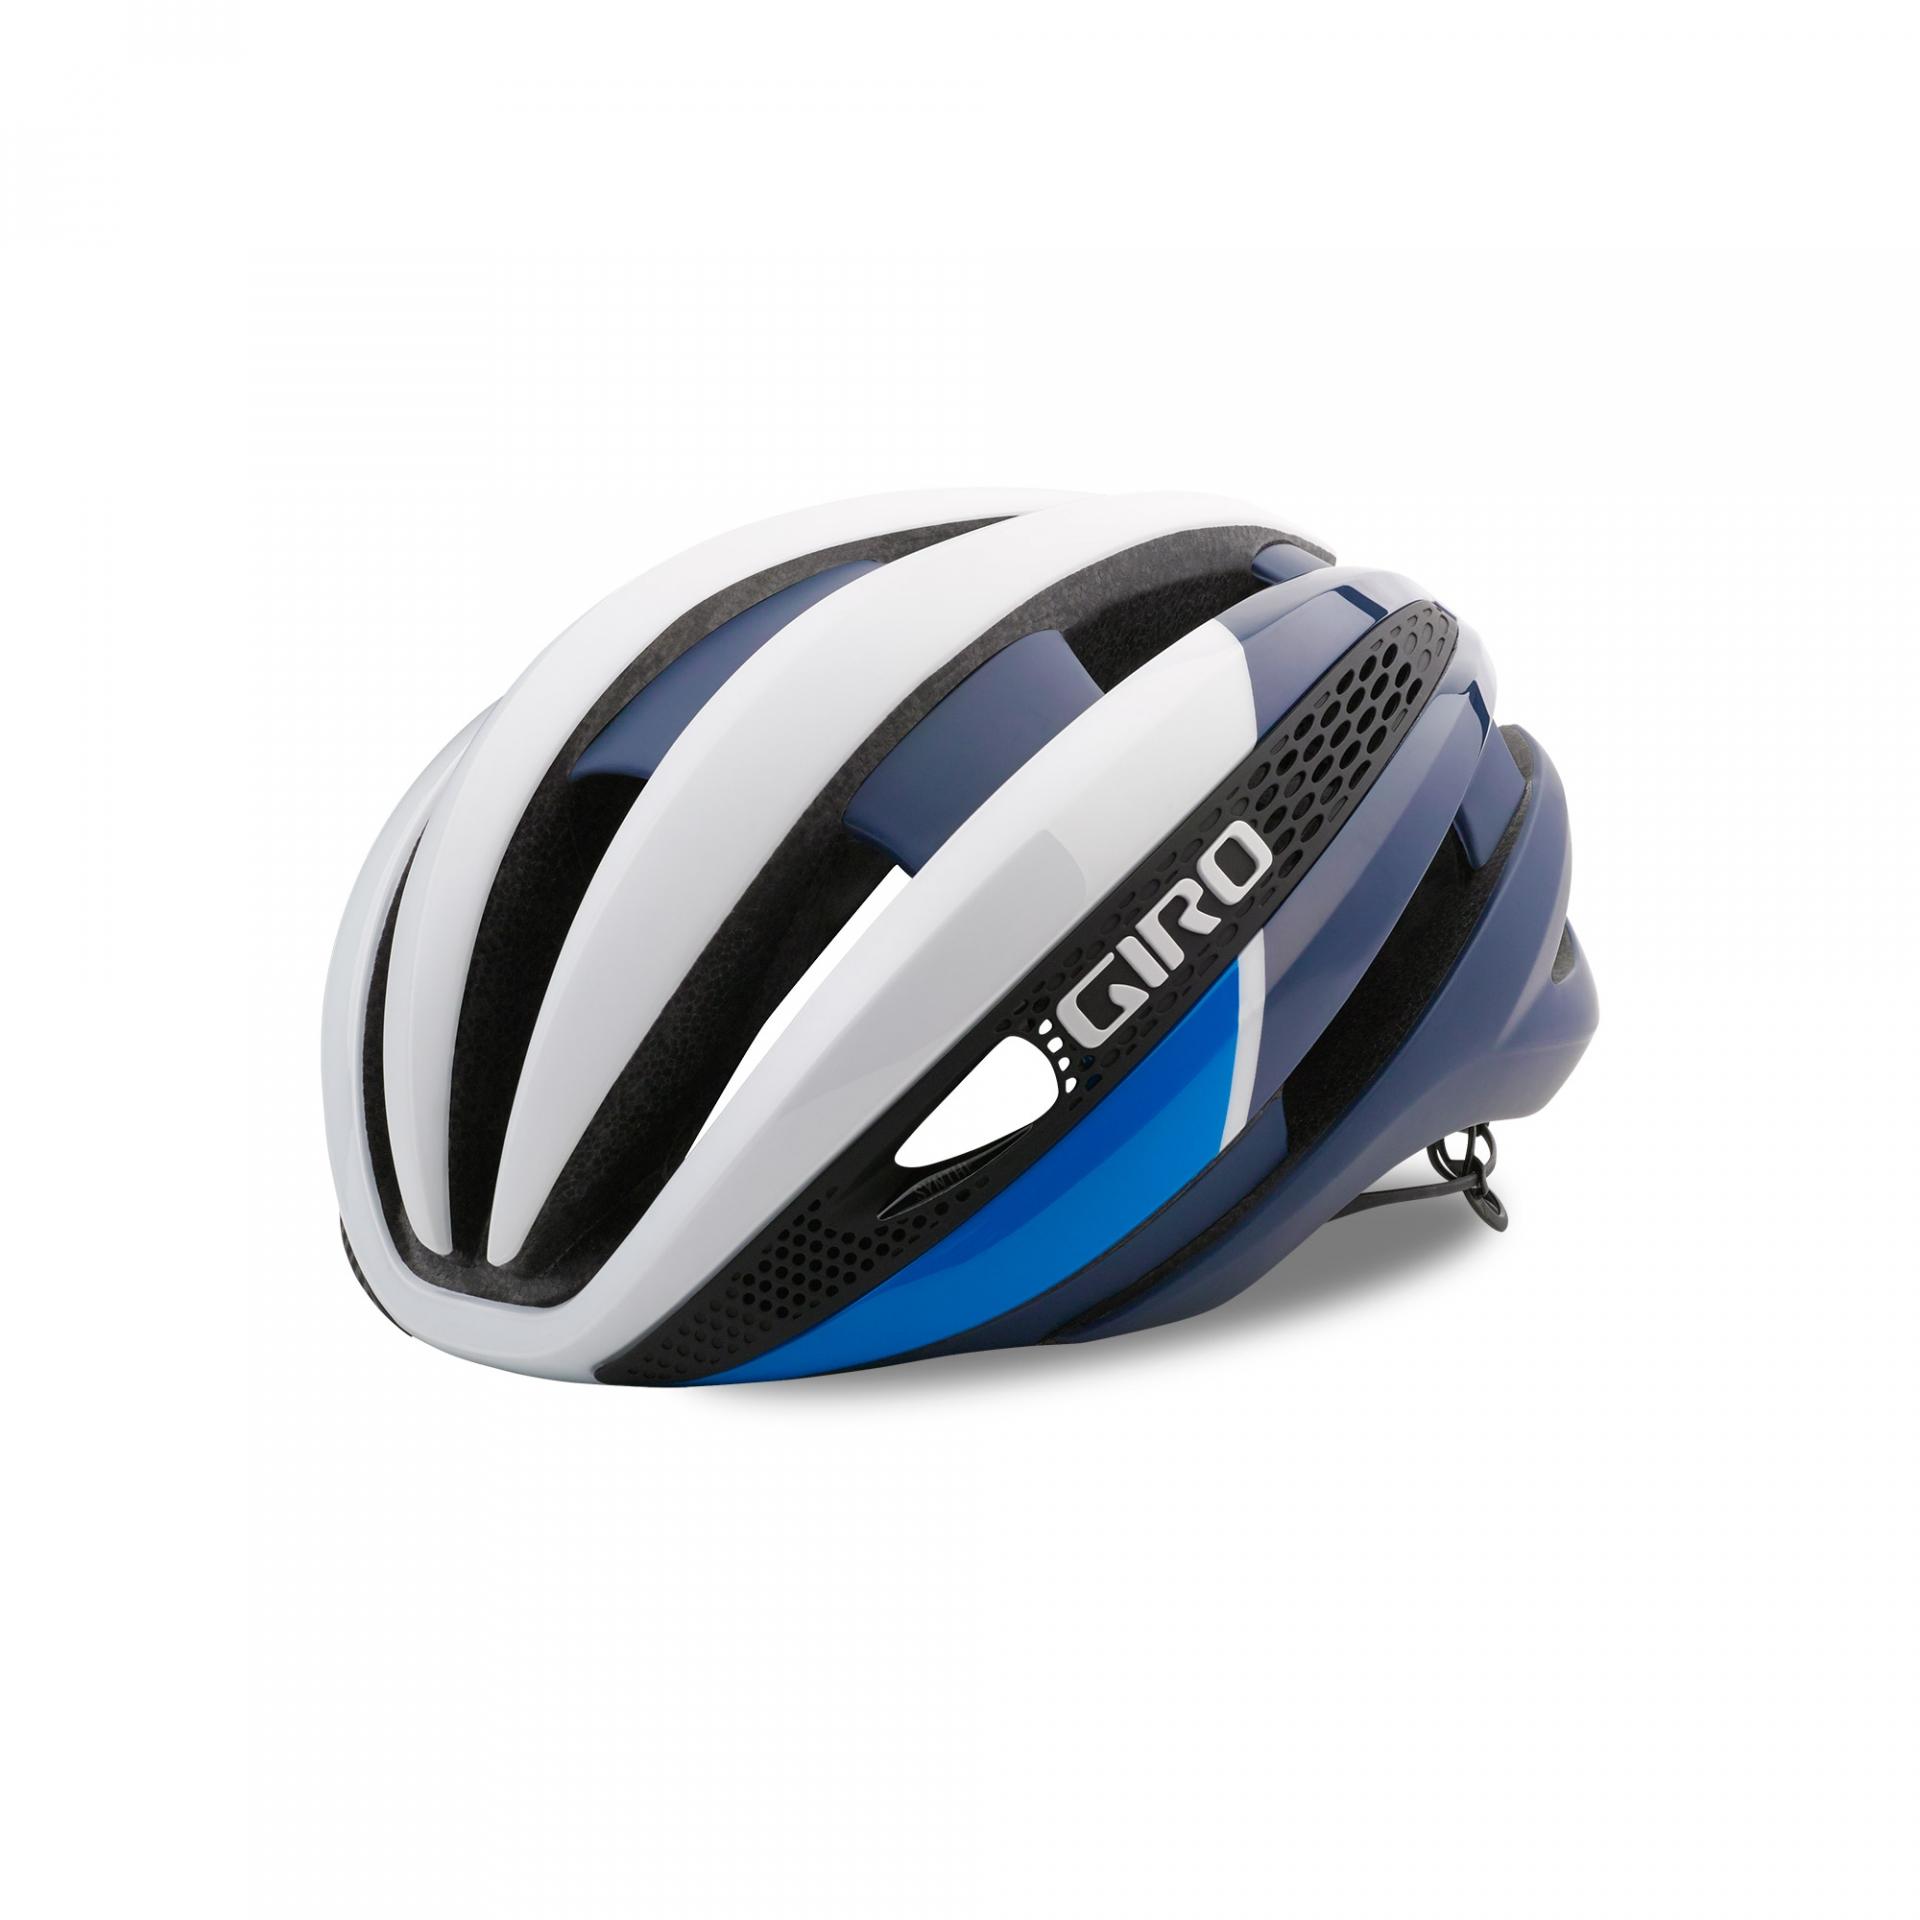 Casque Giro SYNTHE MIPS Blanc/Bleu - M / 55-59 cm